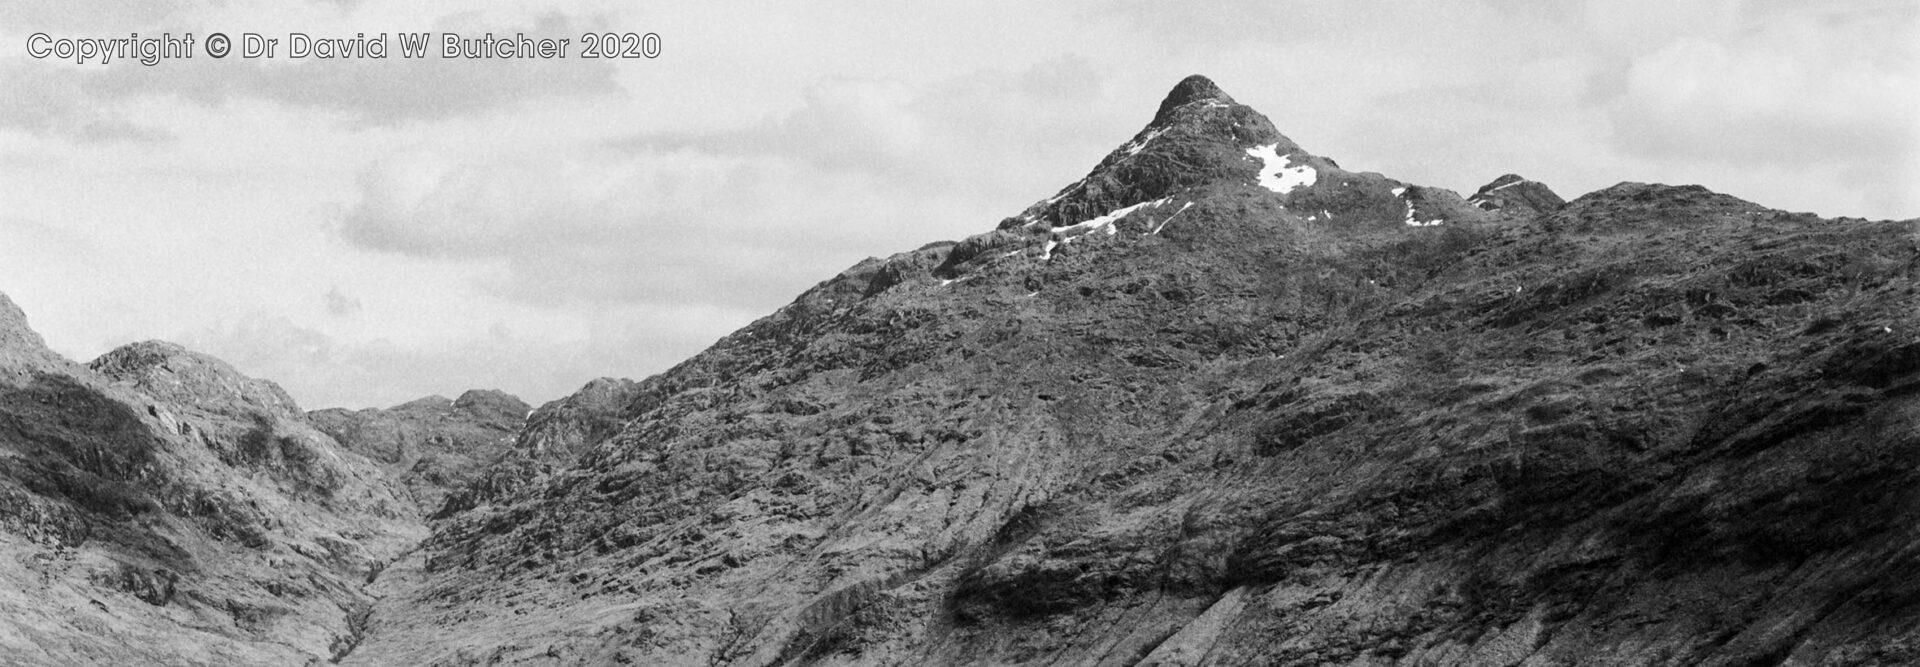 Sgurr na Ciche, Knoydart, Scotland